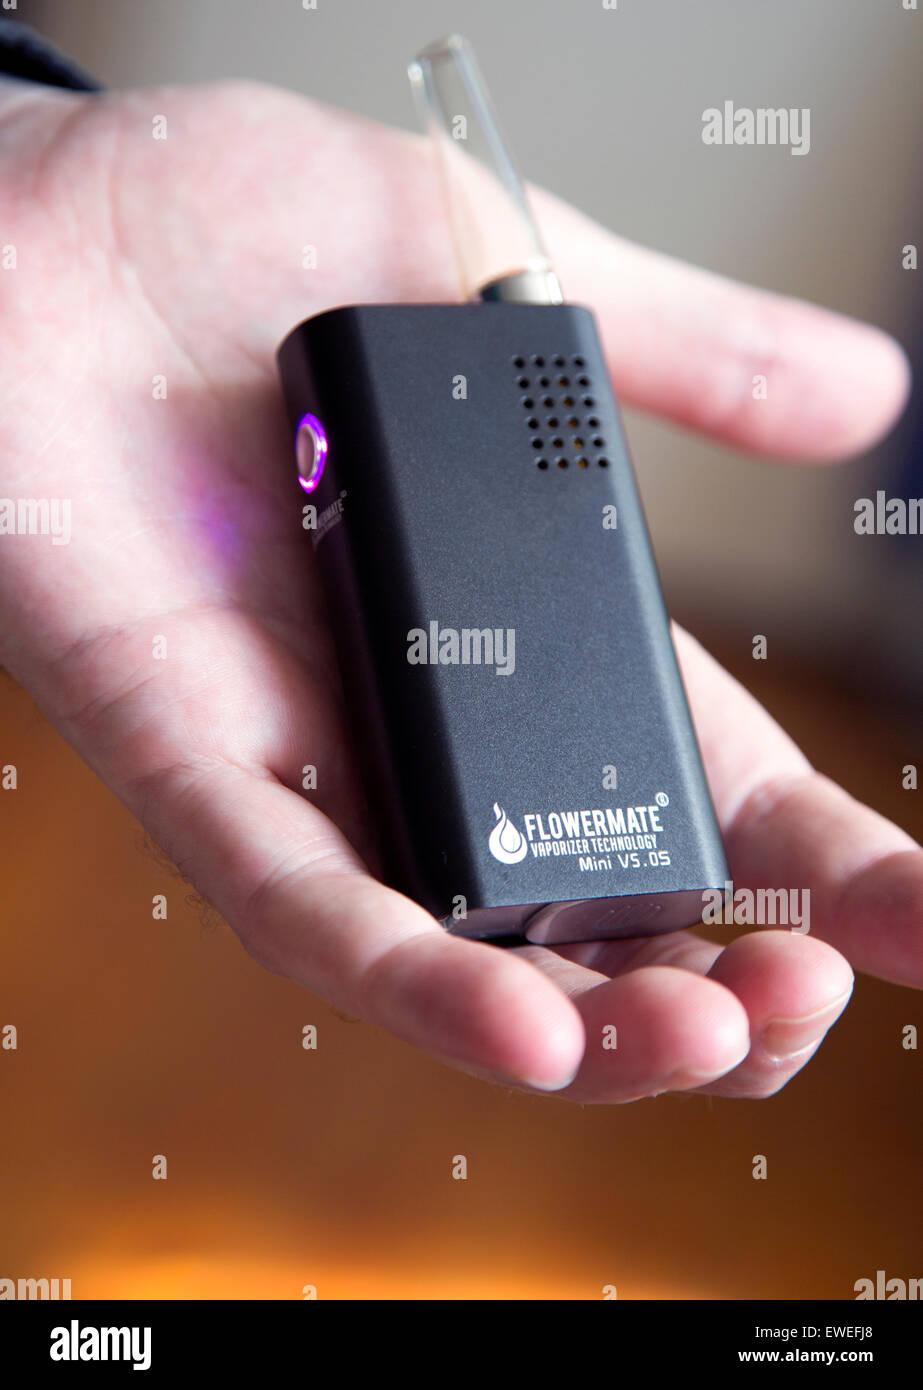 Flowermate Mini portable rechargable vaporiser for consumption of herbs, London - Stock Image